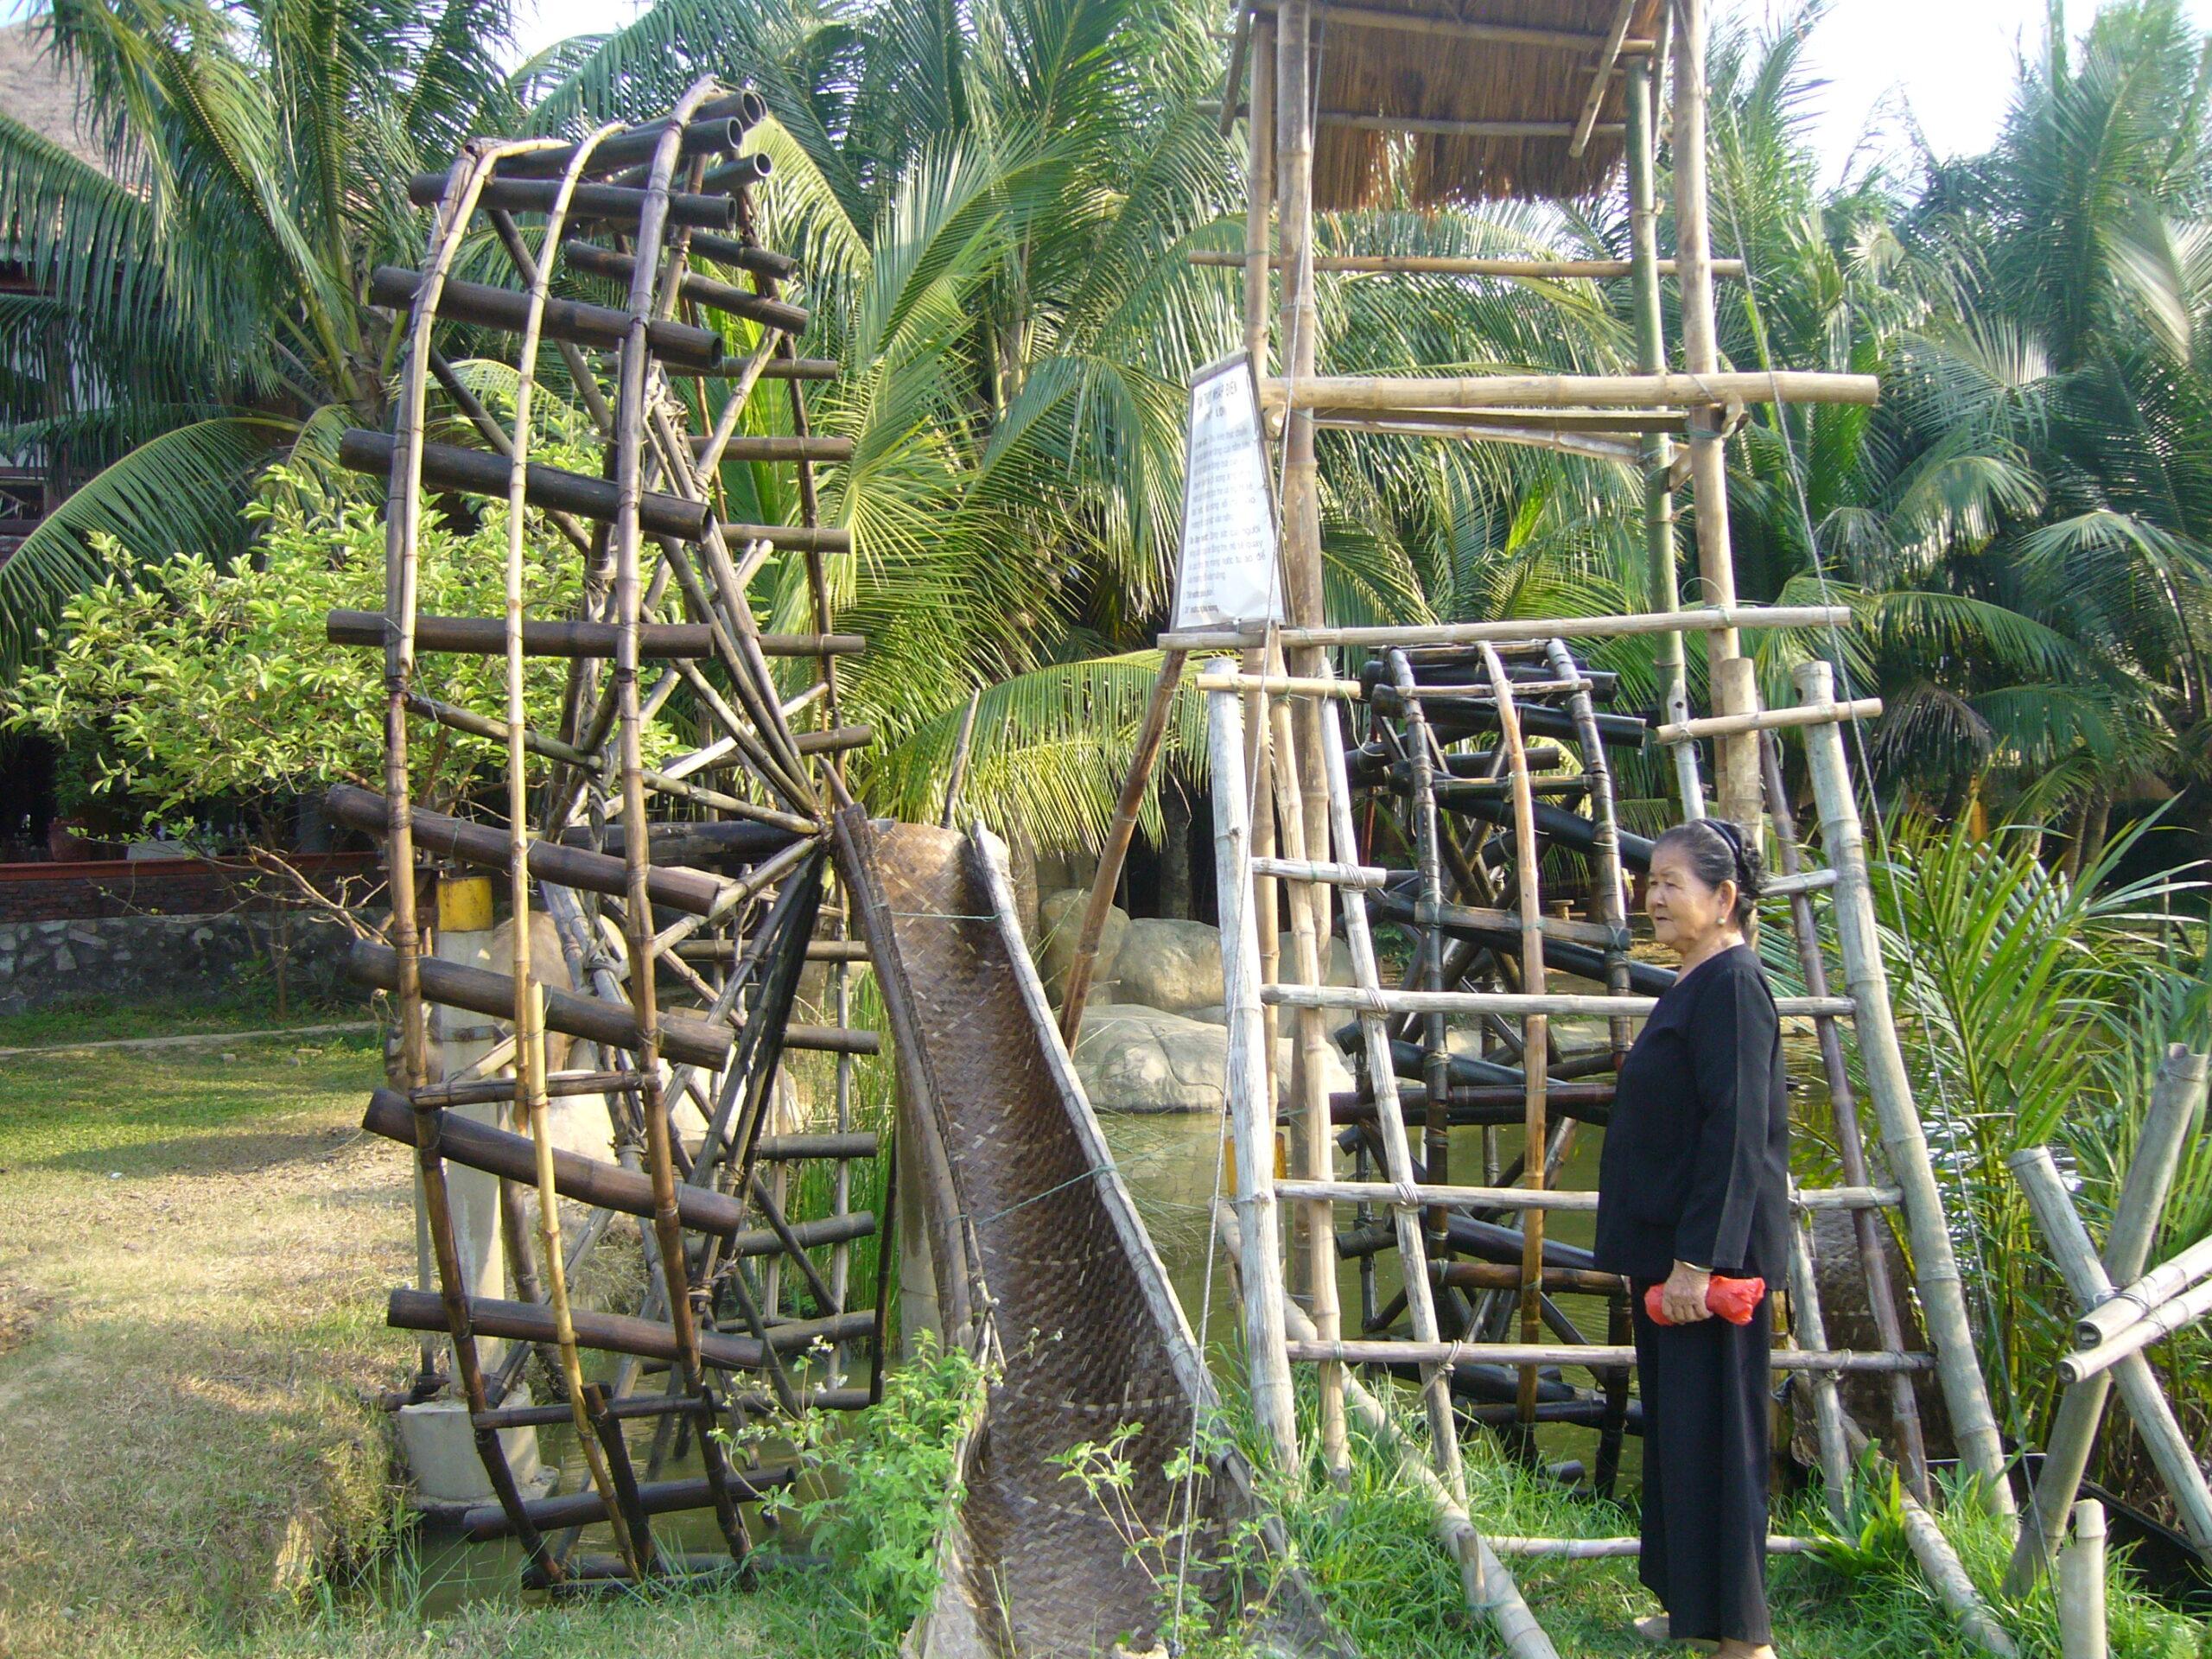 Bridge Project #11